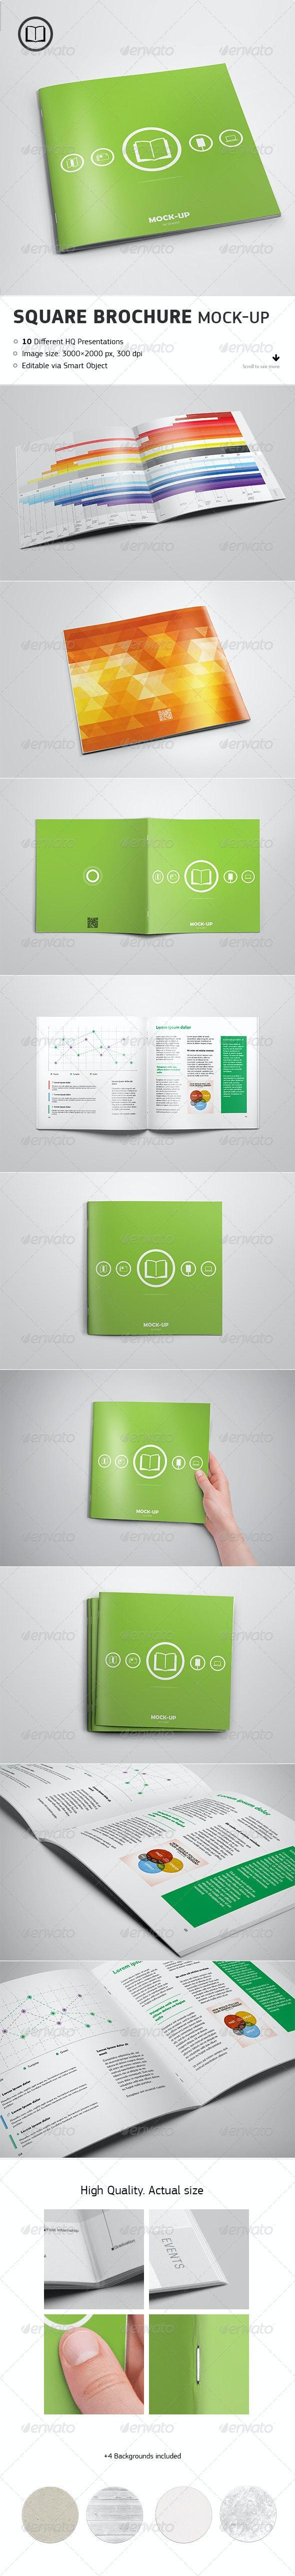 Square Brochure Mock-up - Brochures Print